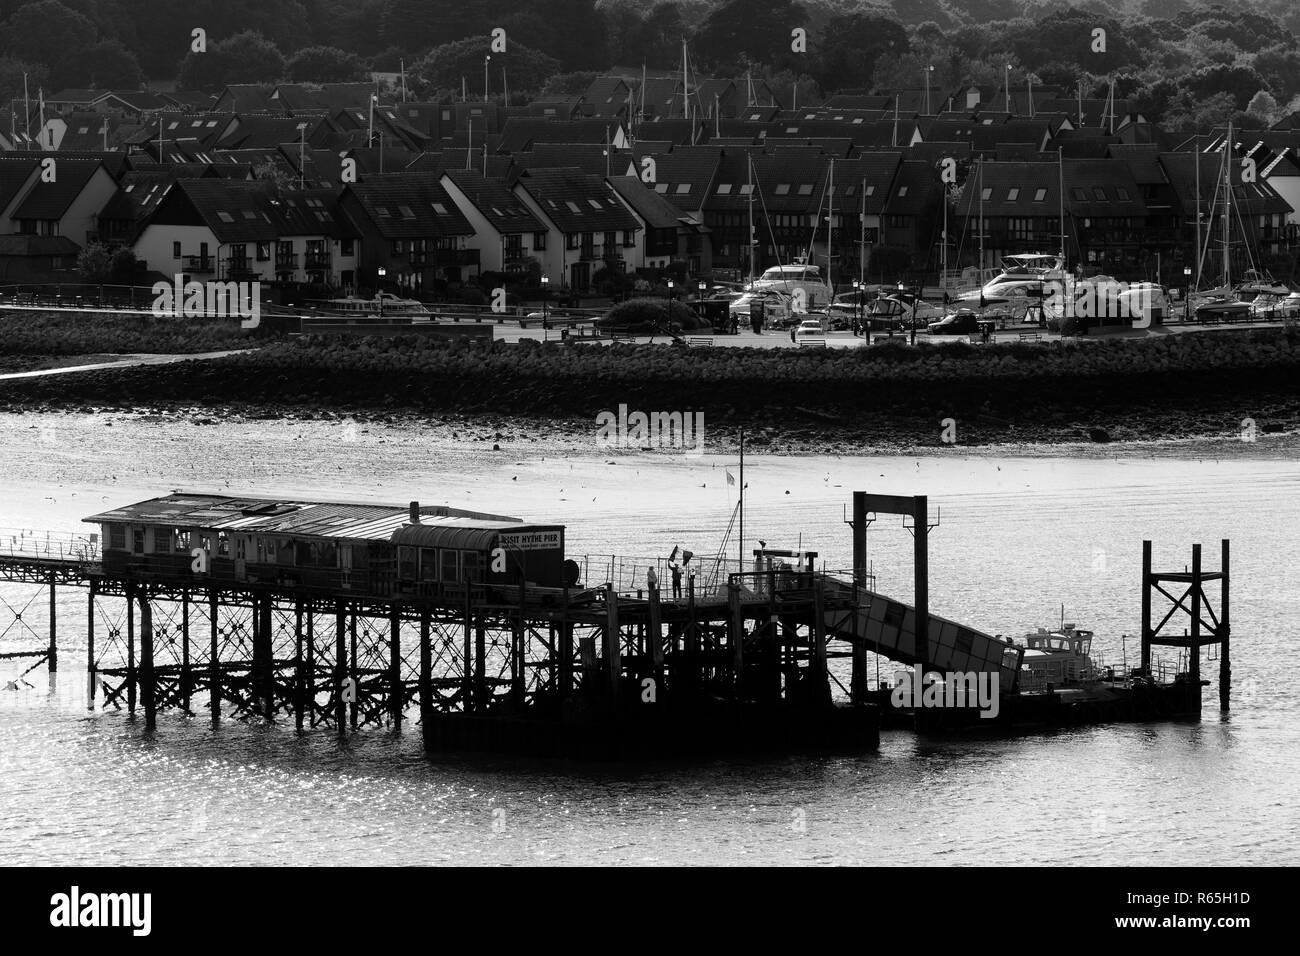 Hythe Town Pier, Hampshire, England, United Kingdom - Stock Image